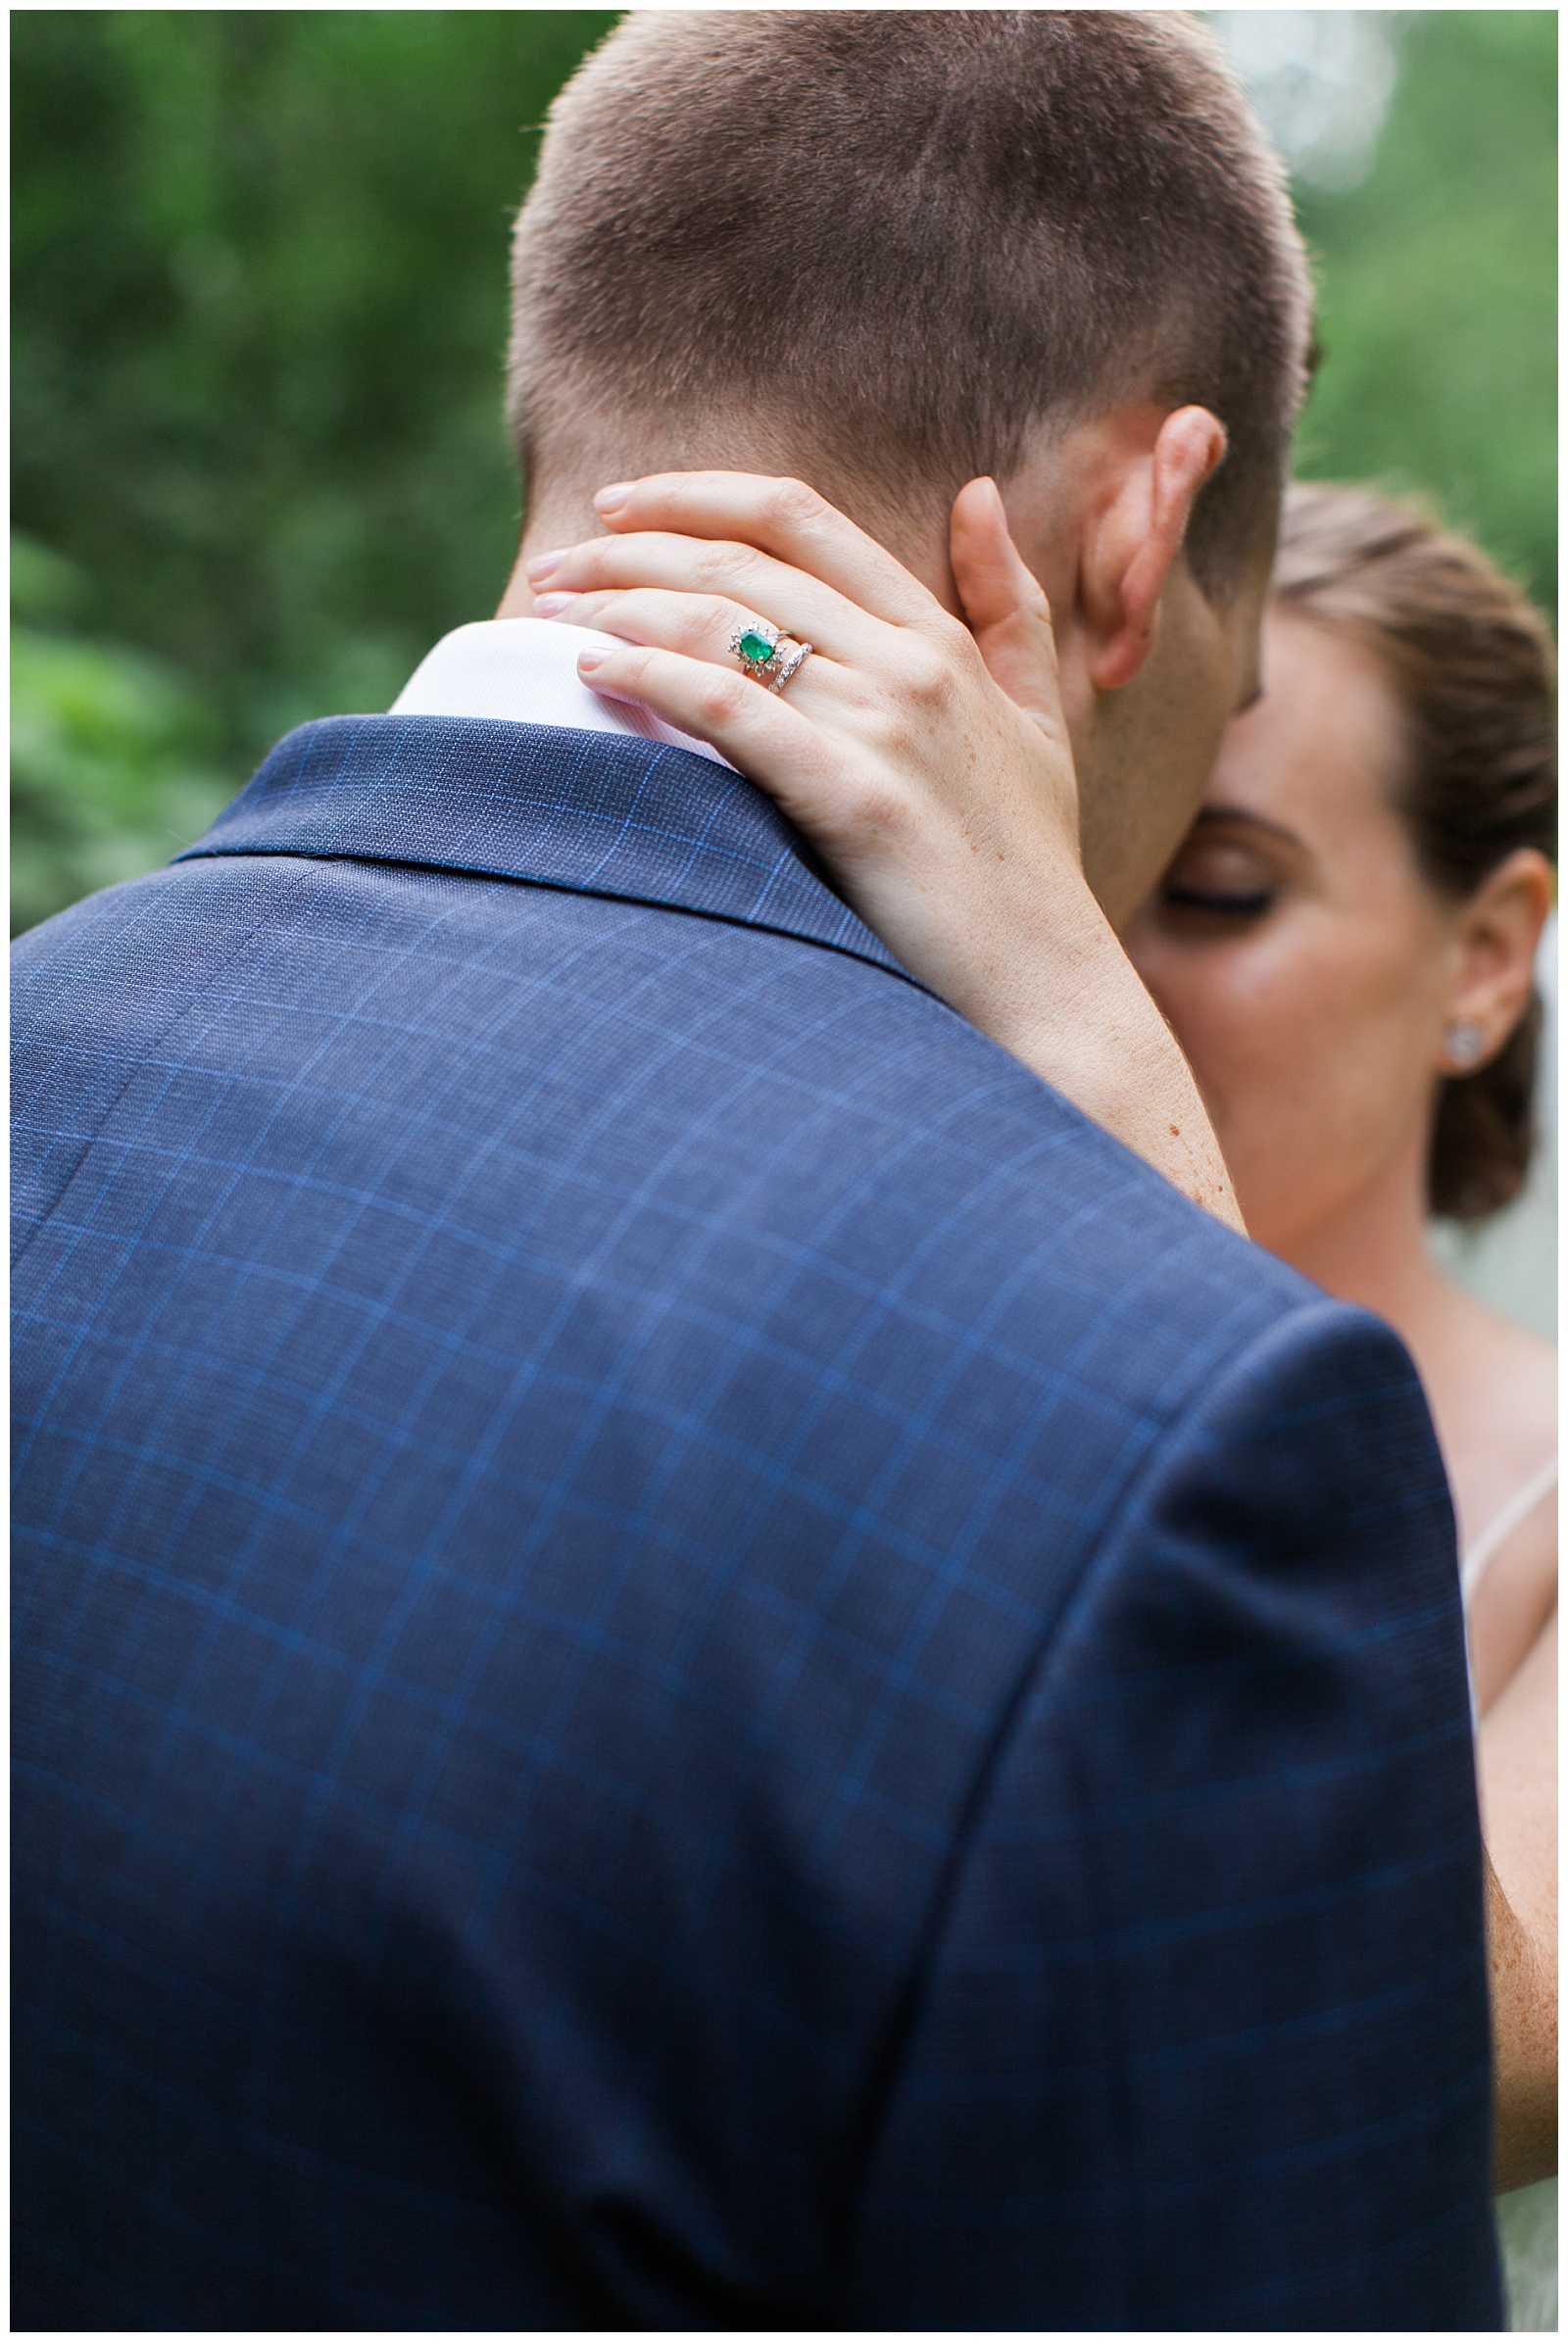 Bride hand gently around groom's neck at Guelph Ontario Wedding | Ontario Wedding Photographer | Toronto Wedding Photographer | 3photography